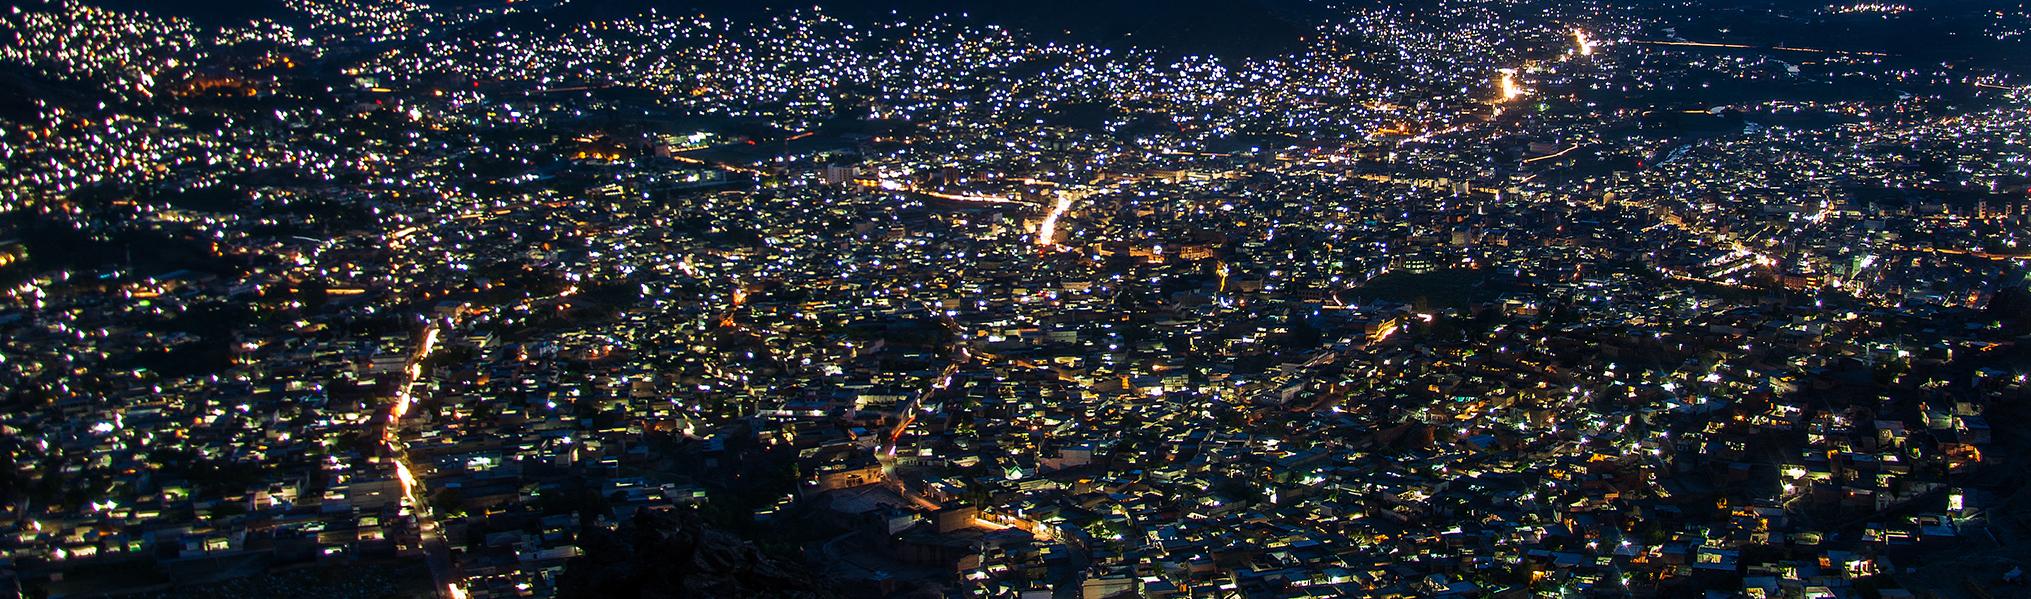 urban-night-1.png